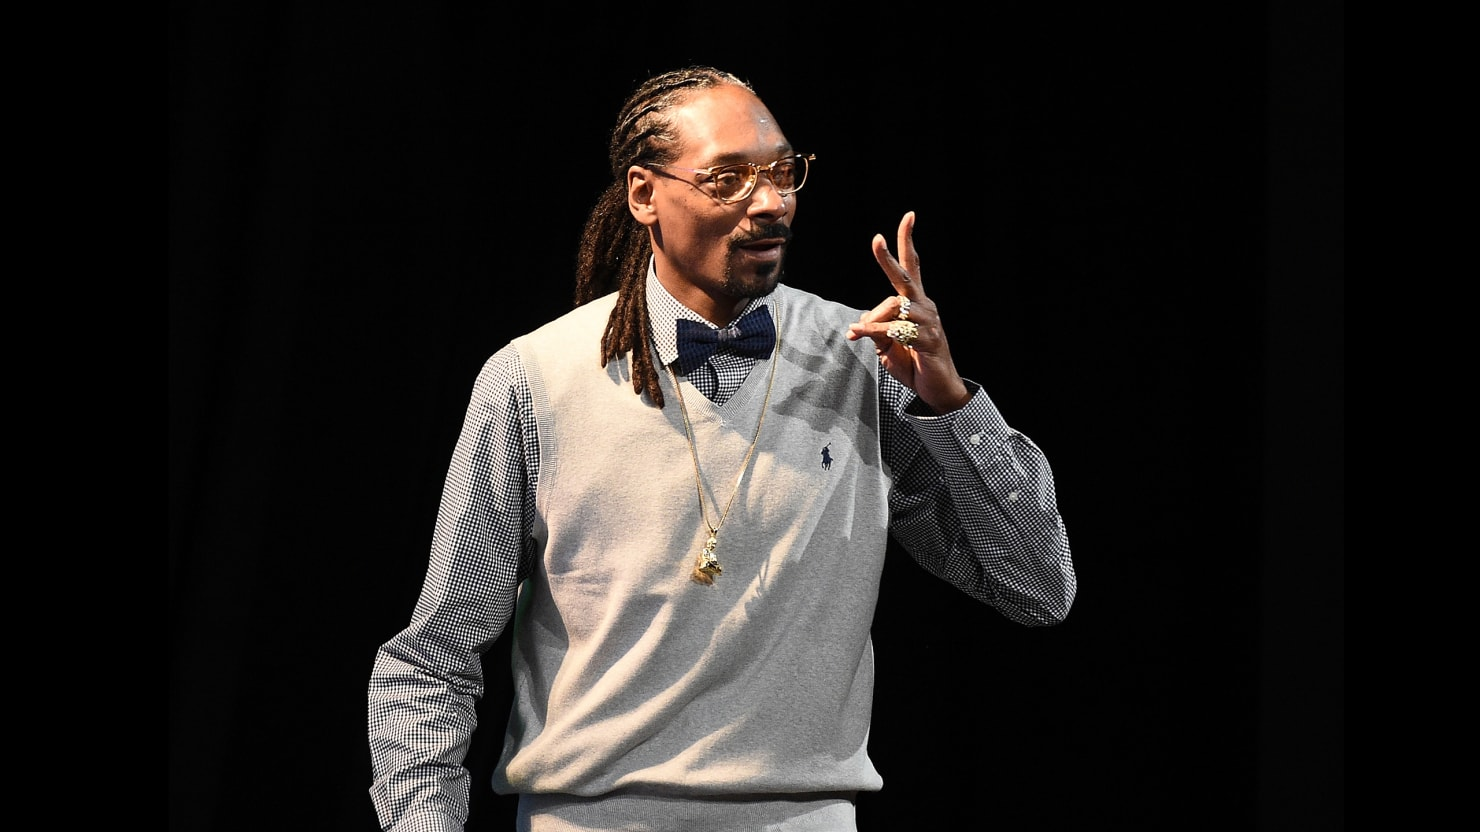 L Dogg Snoop Dogg: Ron...